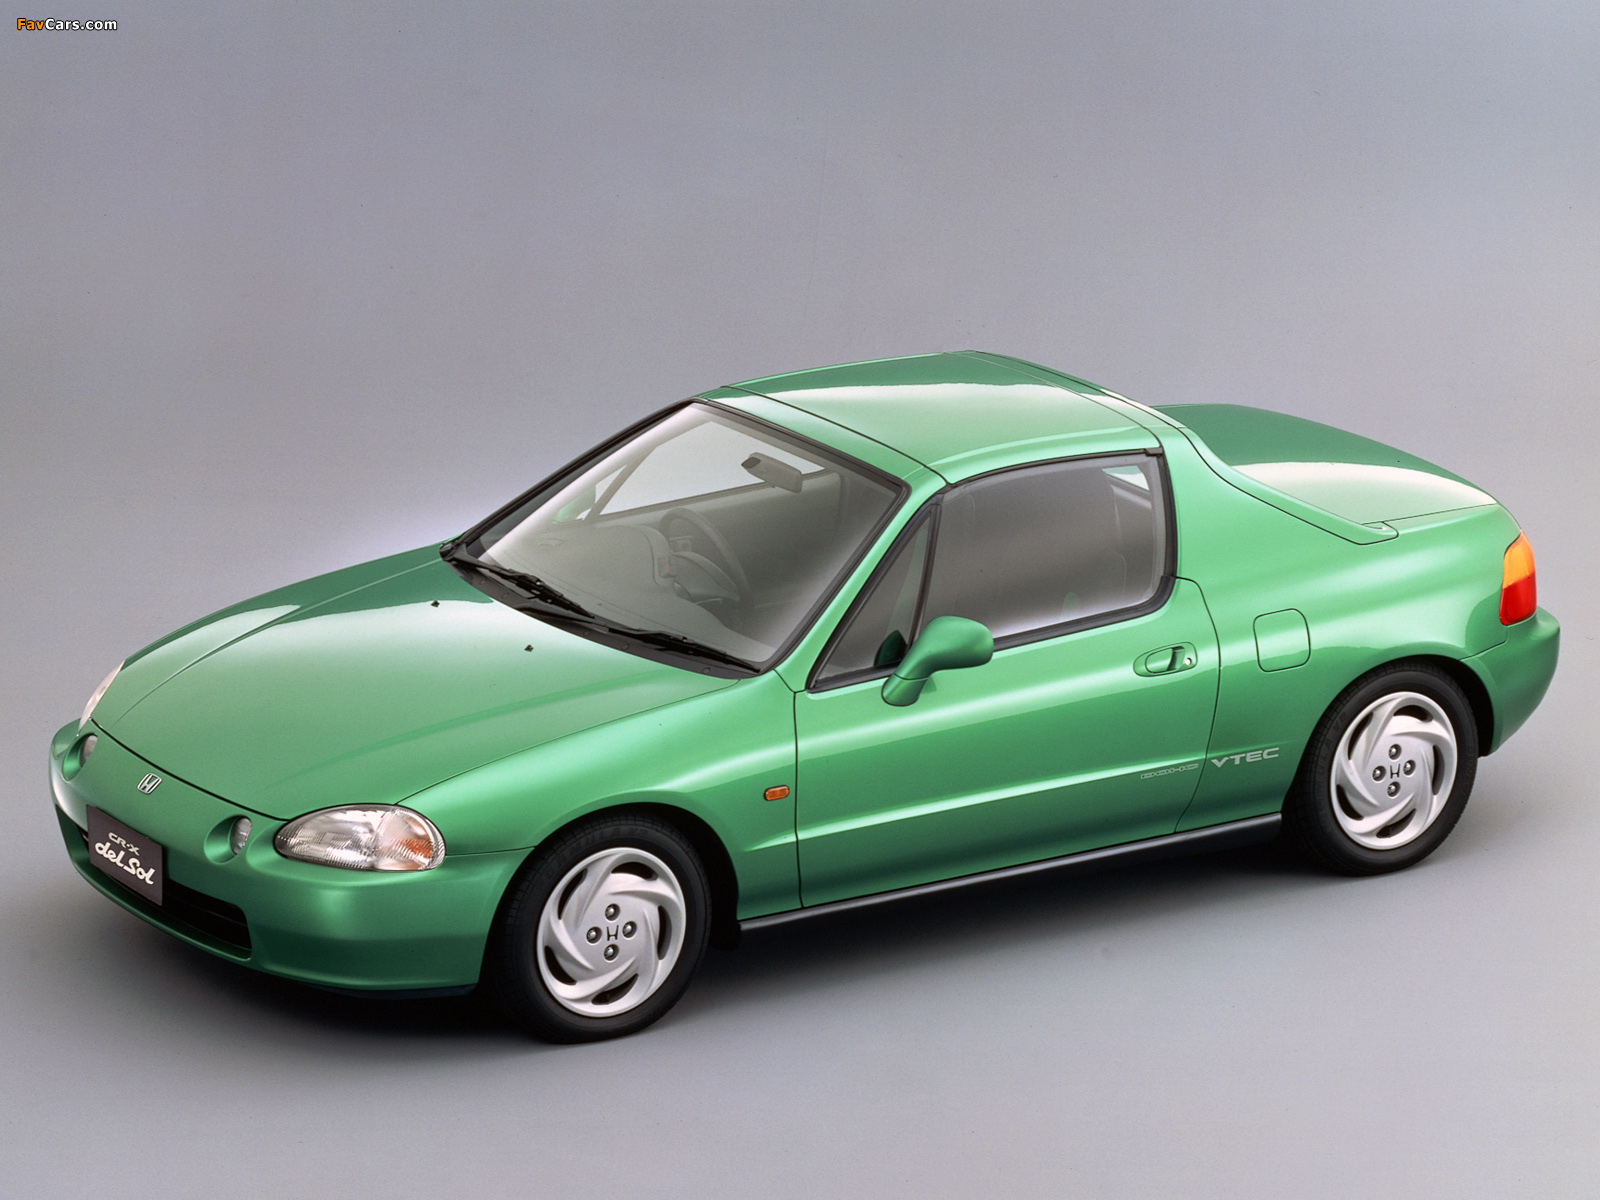 Honda Cr X >> Honda CR-X del Sol SiR (EG2) 1992–98 pictures (1600x1200)